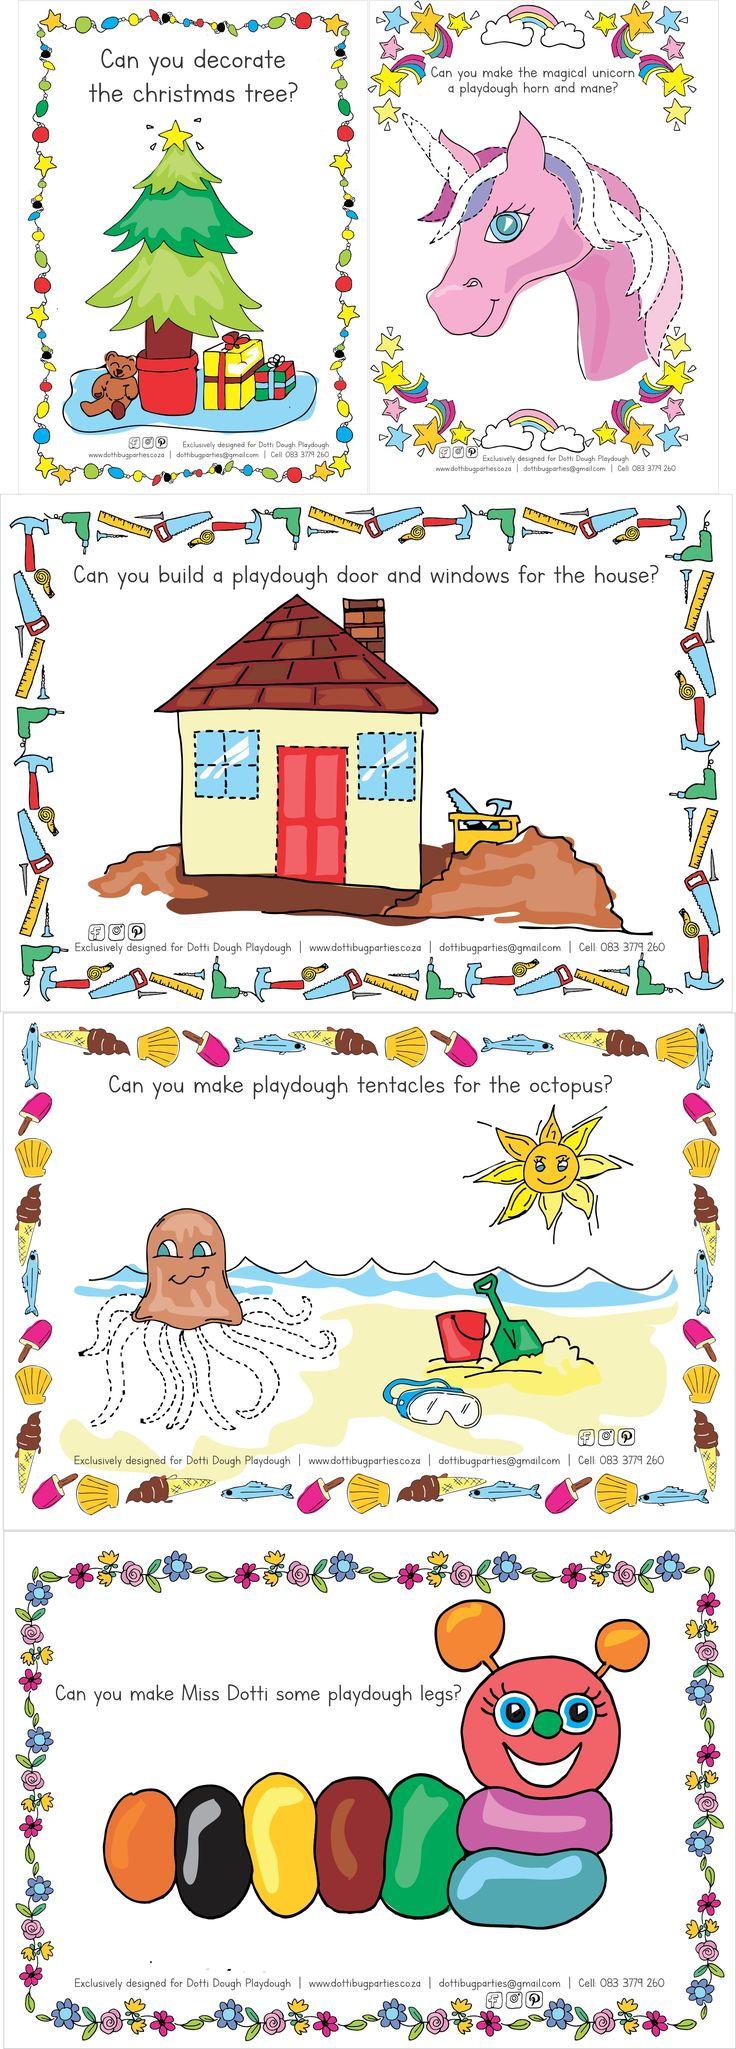 Play dough templates for little kids.  #illustration #unicorn #christmas #sealife #beach